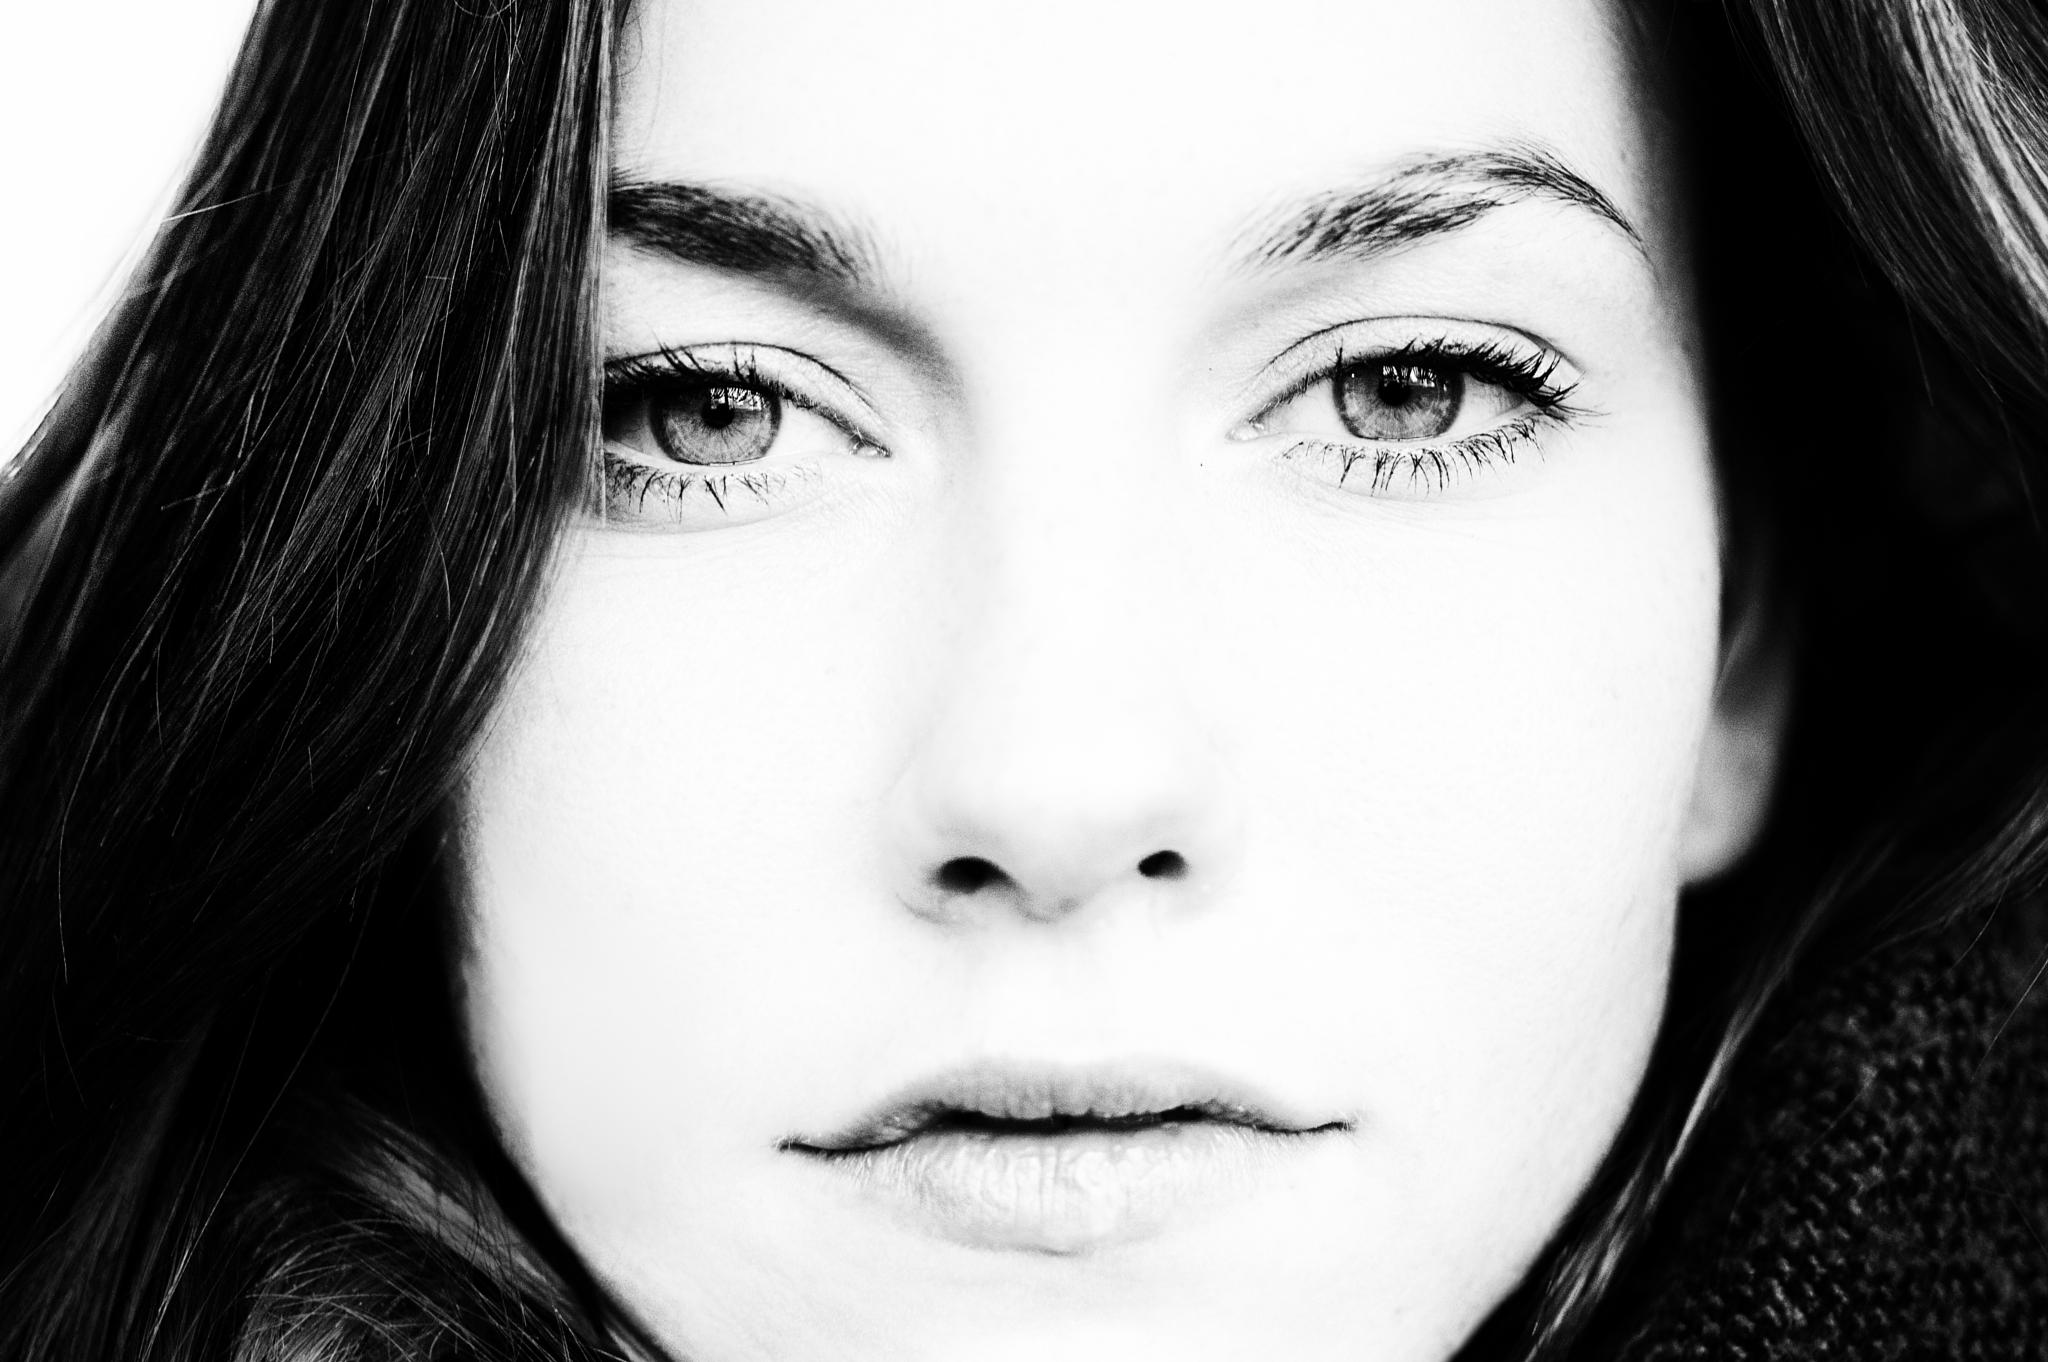 Look into my eyes by marjolein.parijs